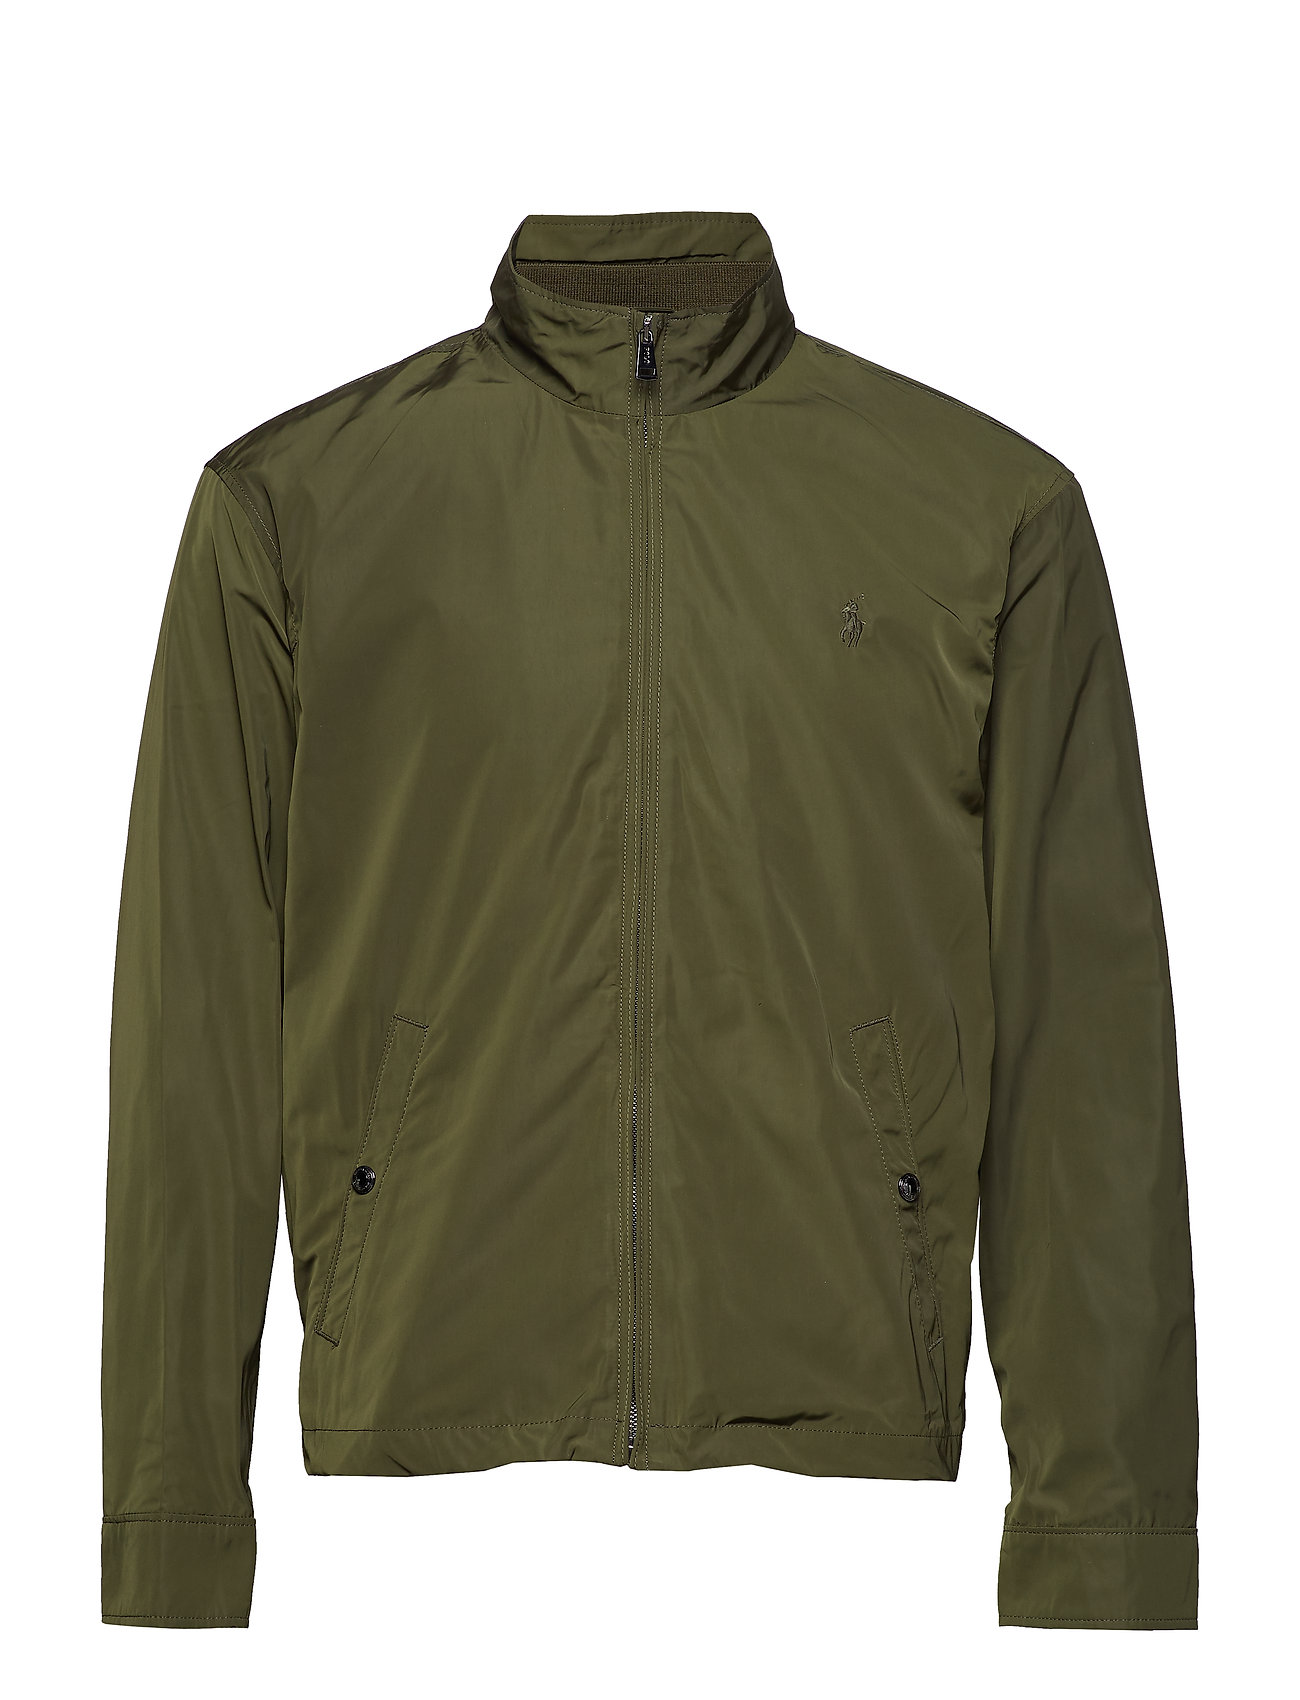 96bb72c329da Lightweight Jacket (Armadillo) (£139.75) - Polo Ralph Lauren ...